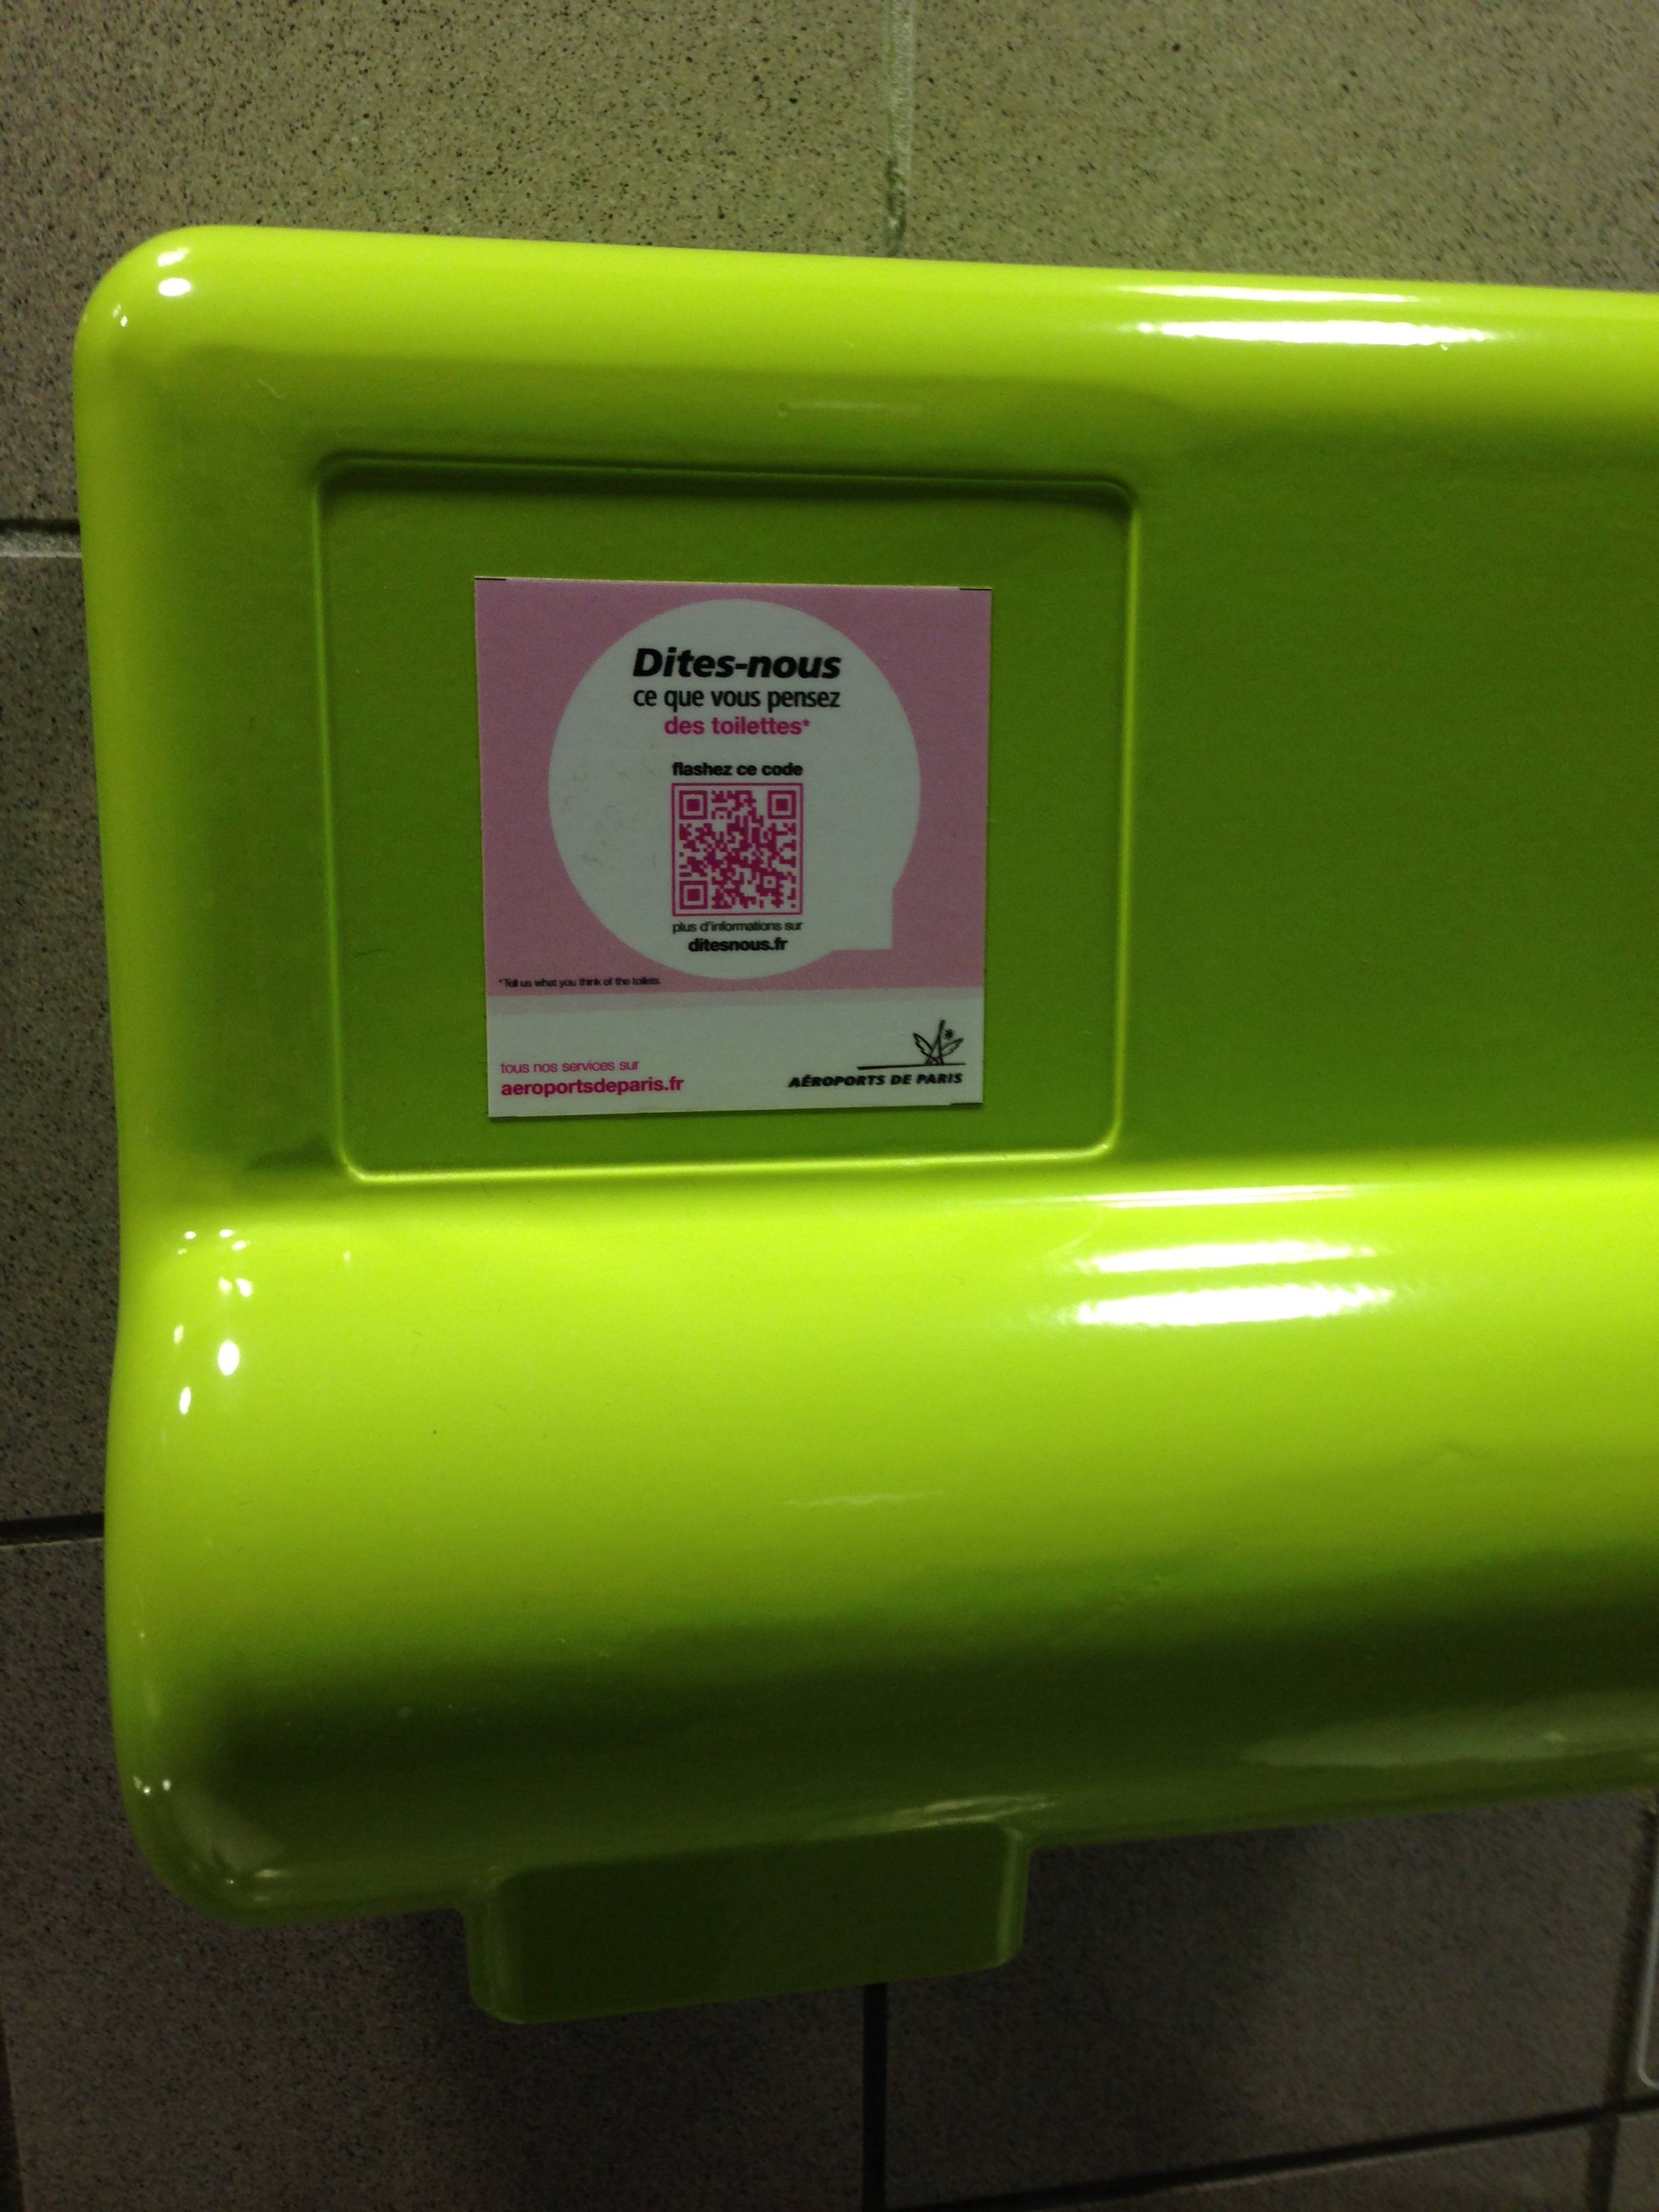 QR code at ADP, The Myndset digital marketing brand strategy